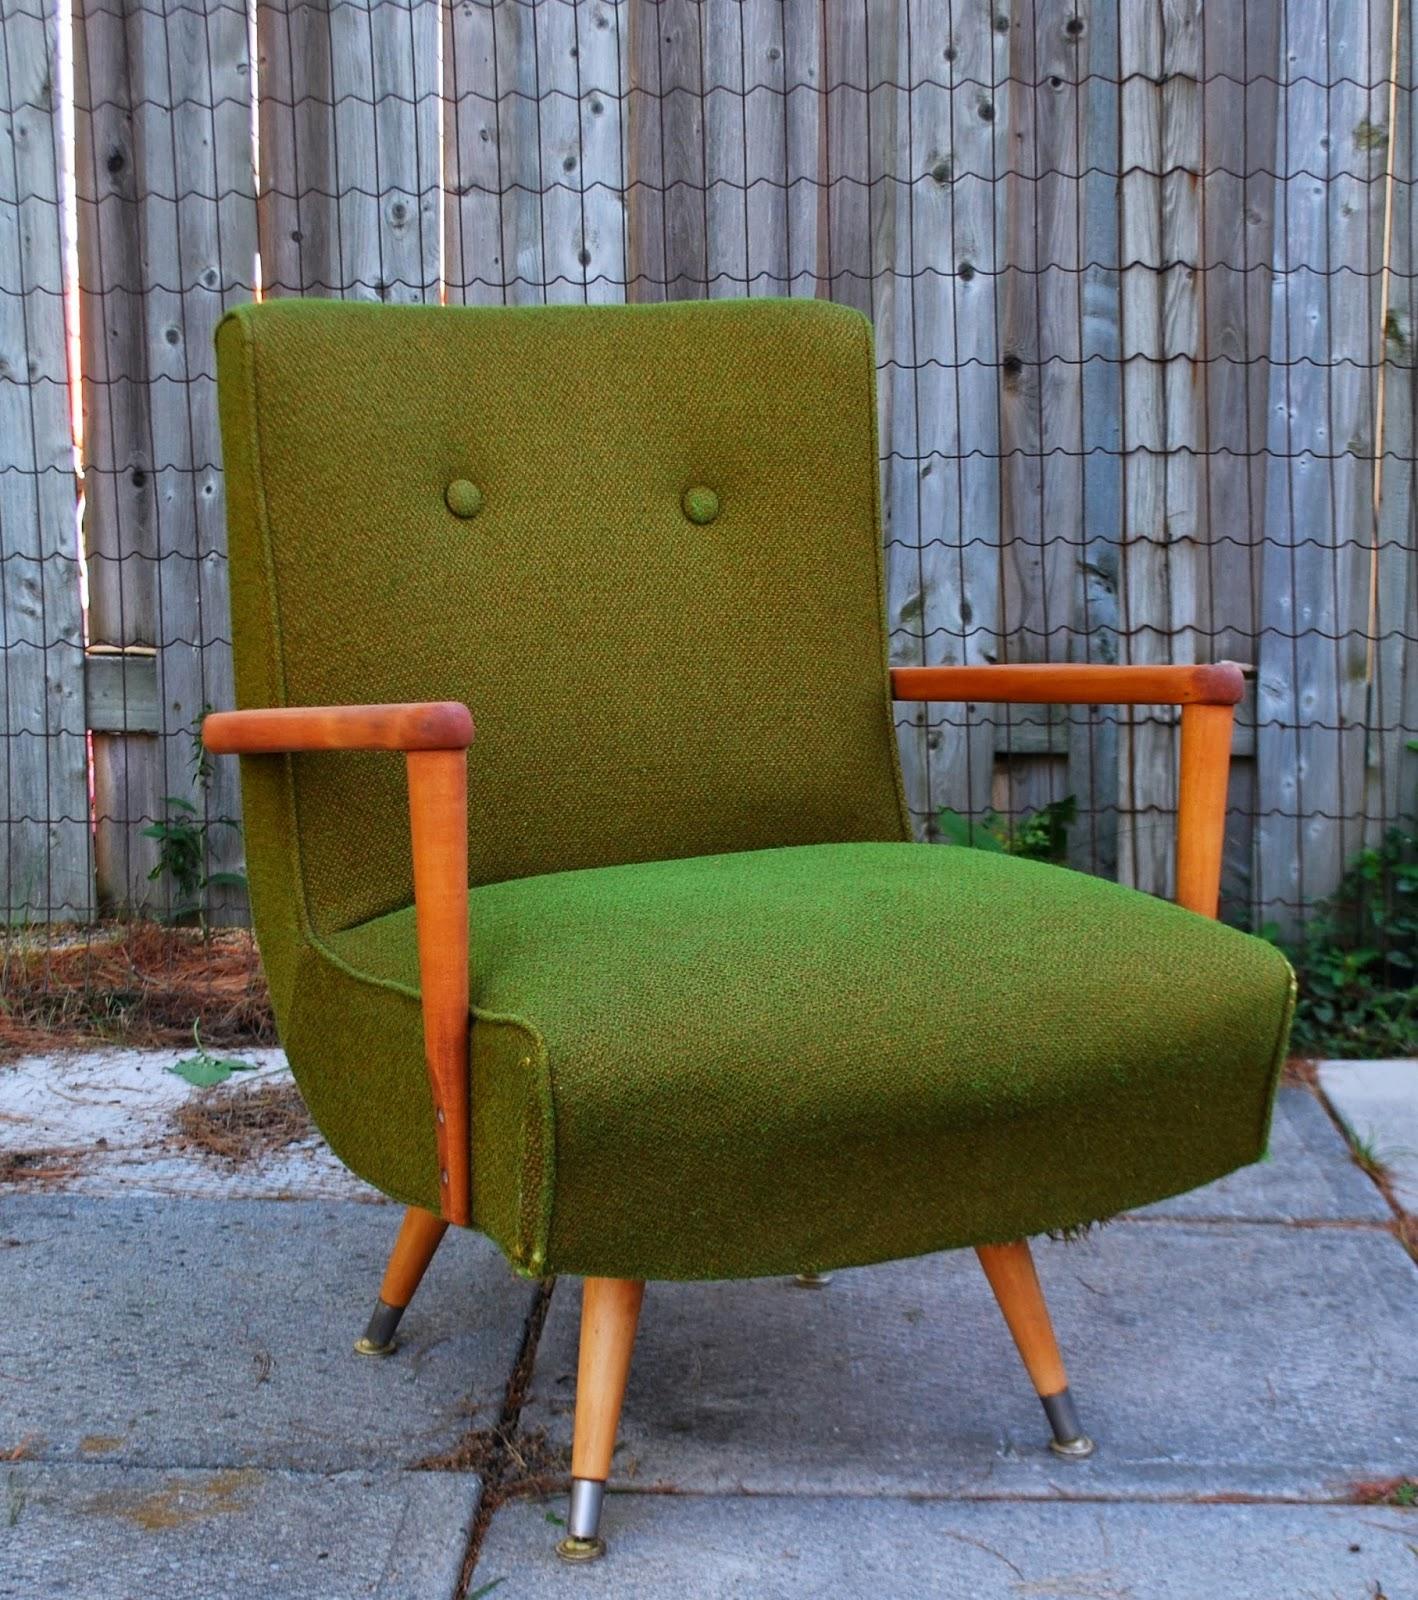 Prime Tribute 20Th Decor Retro Kroehler Swivel Rocker Chair Machost Co Dining Chair Design Ideas Machostcouk